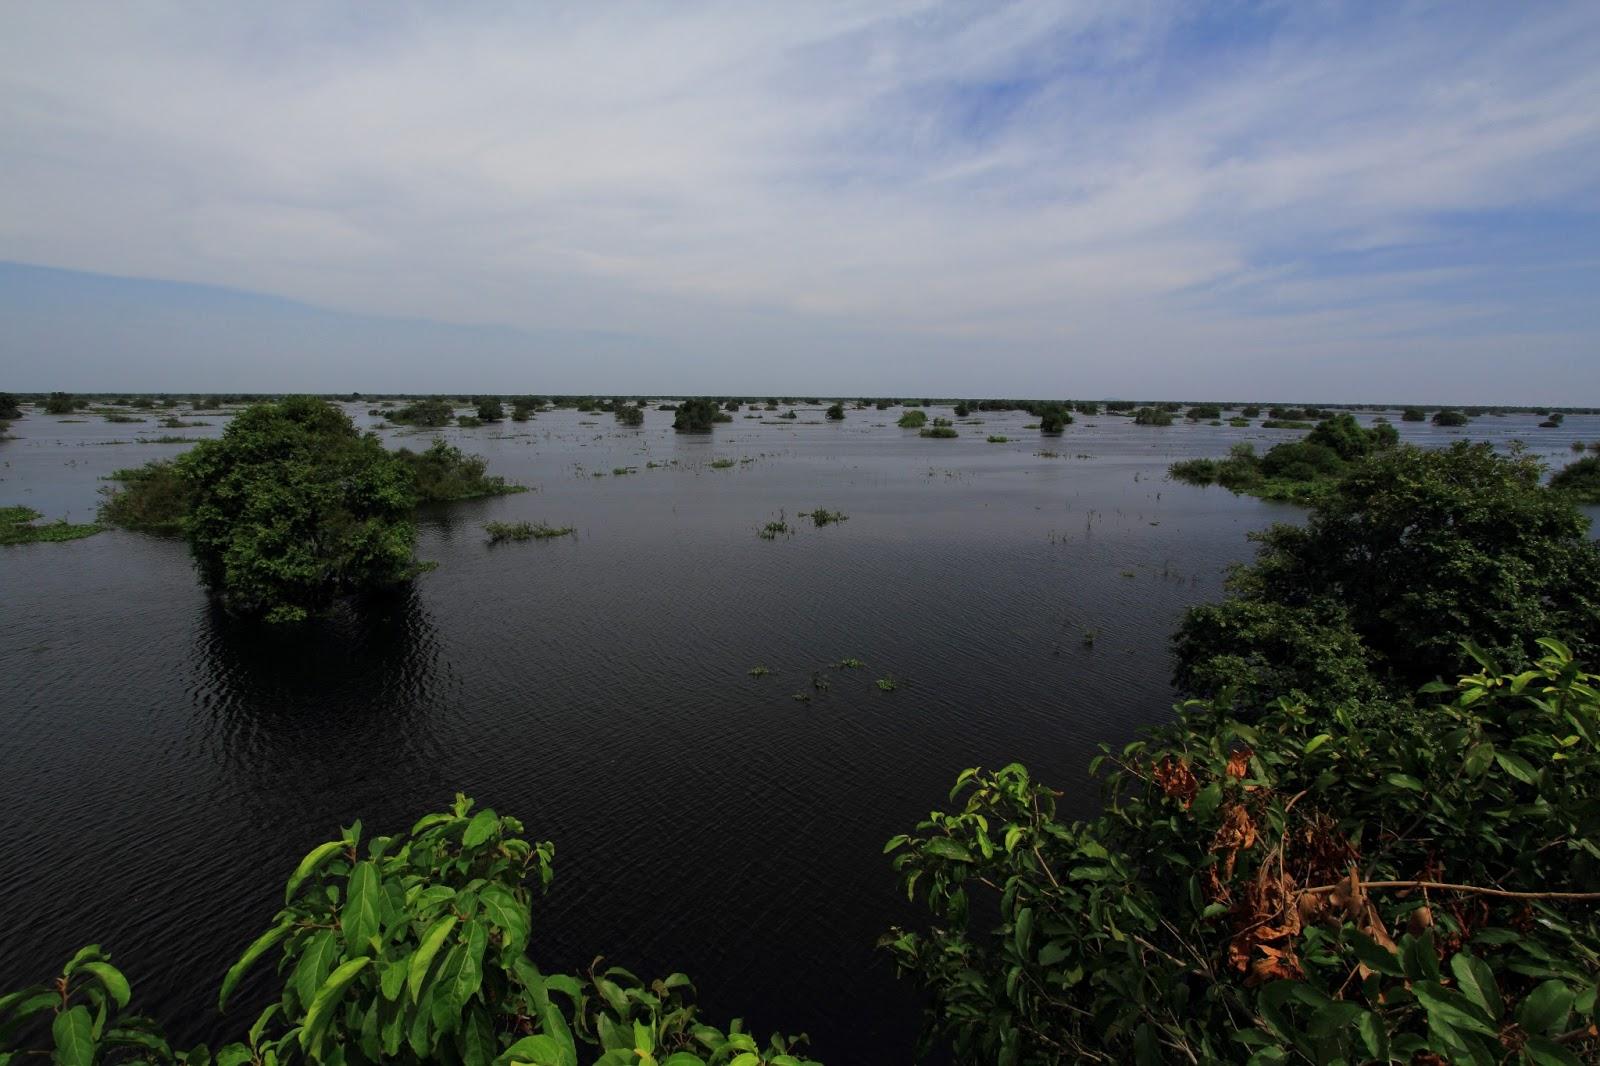 Prek Toal lake